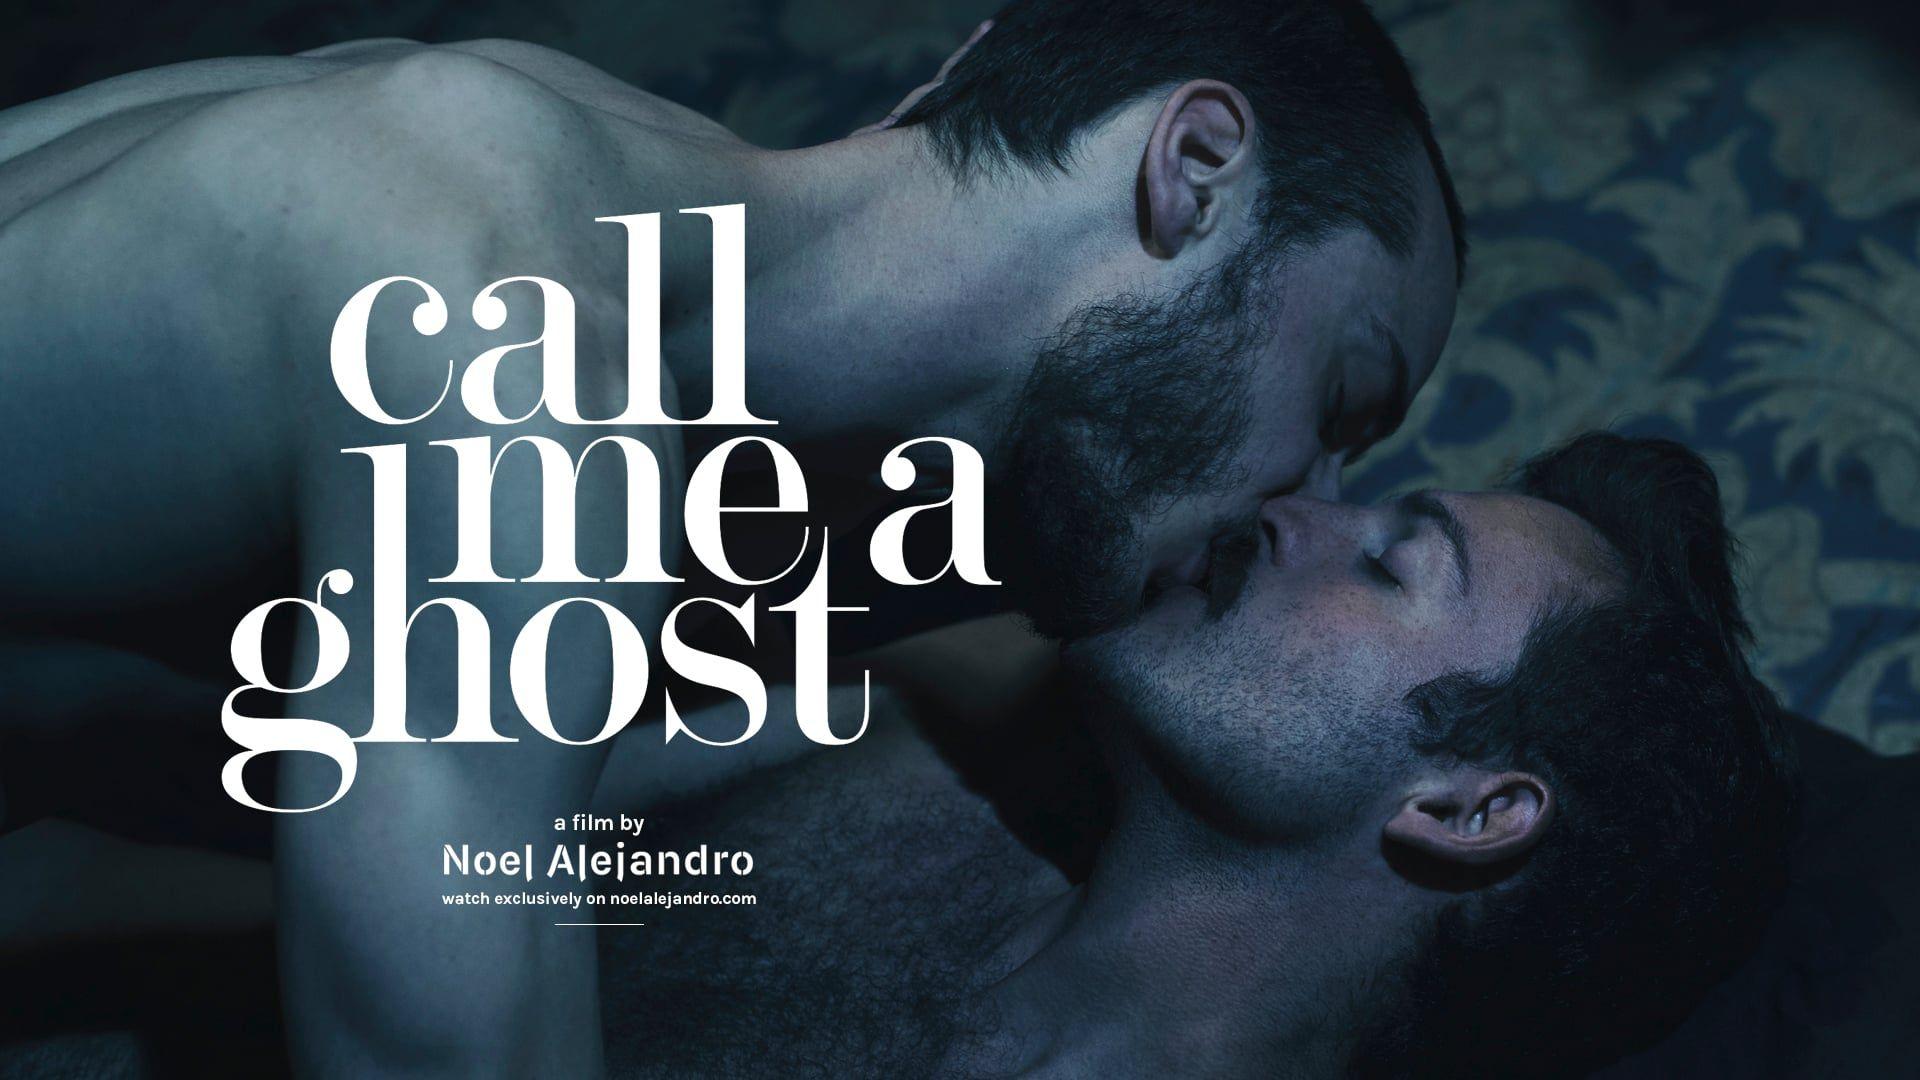 noel alejandro CALL ME A GHOST by Noel Alejandro   trailer soft | queerguru  noel alejandro